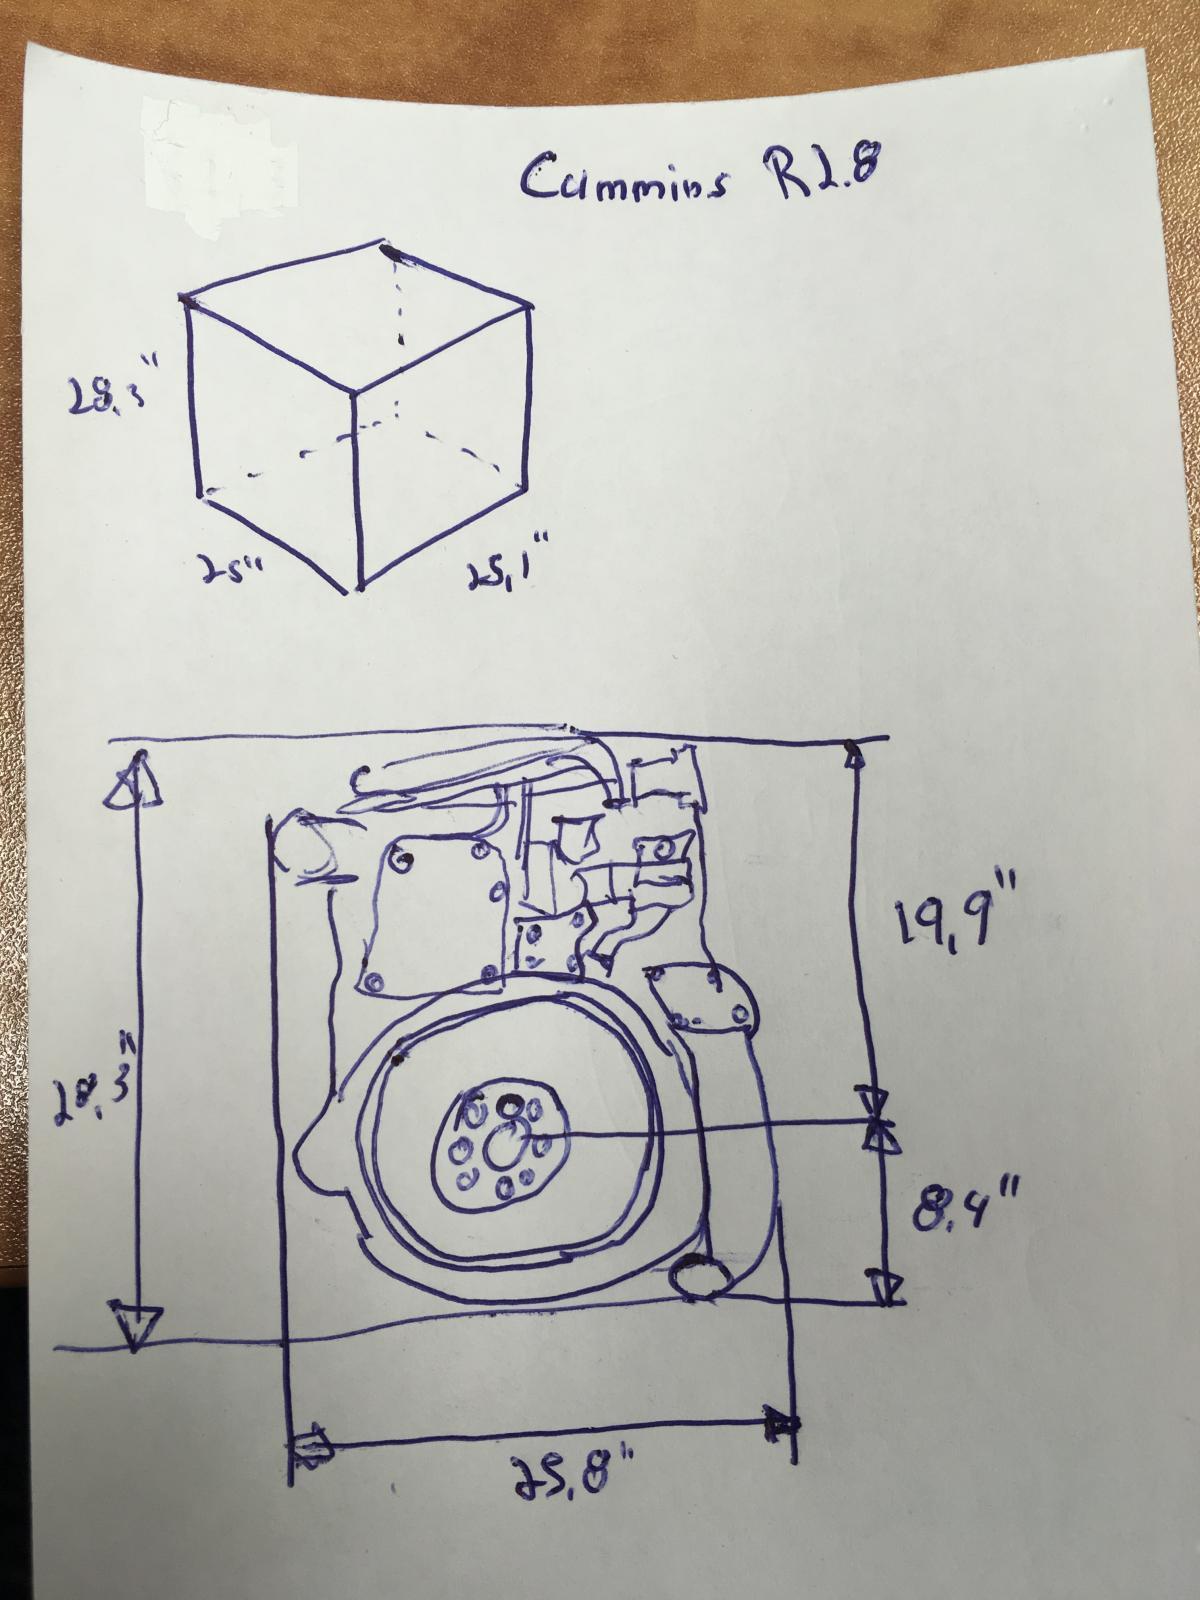 Vanagon Engine Sheet Metal Diagram Free Wiring For You Library Rh 22 Codingcommunity De Gti Schematics